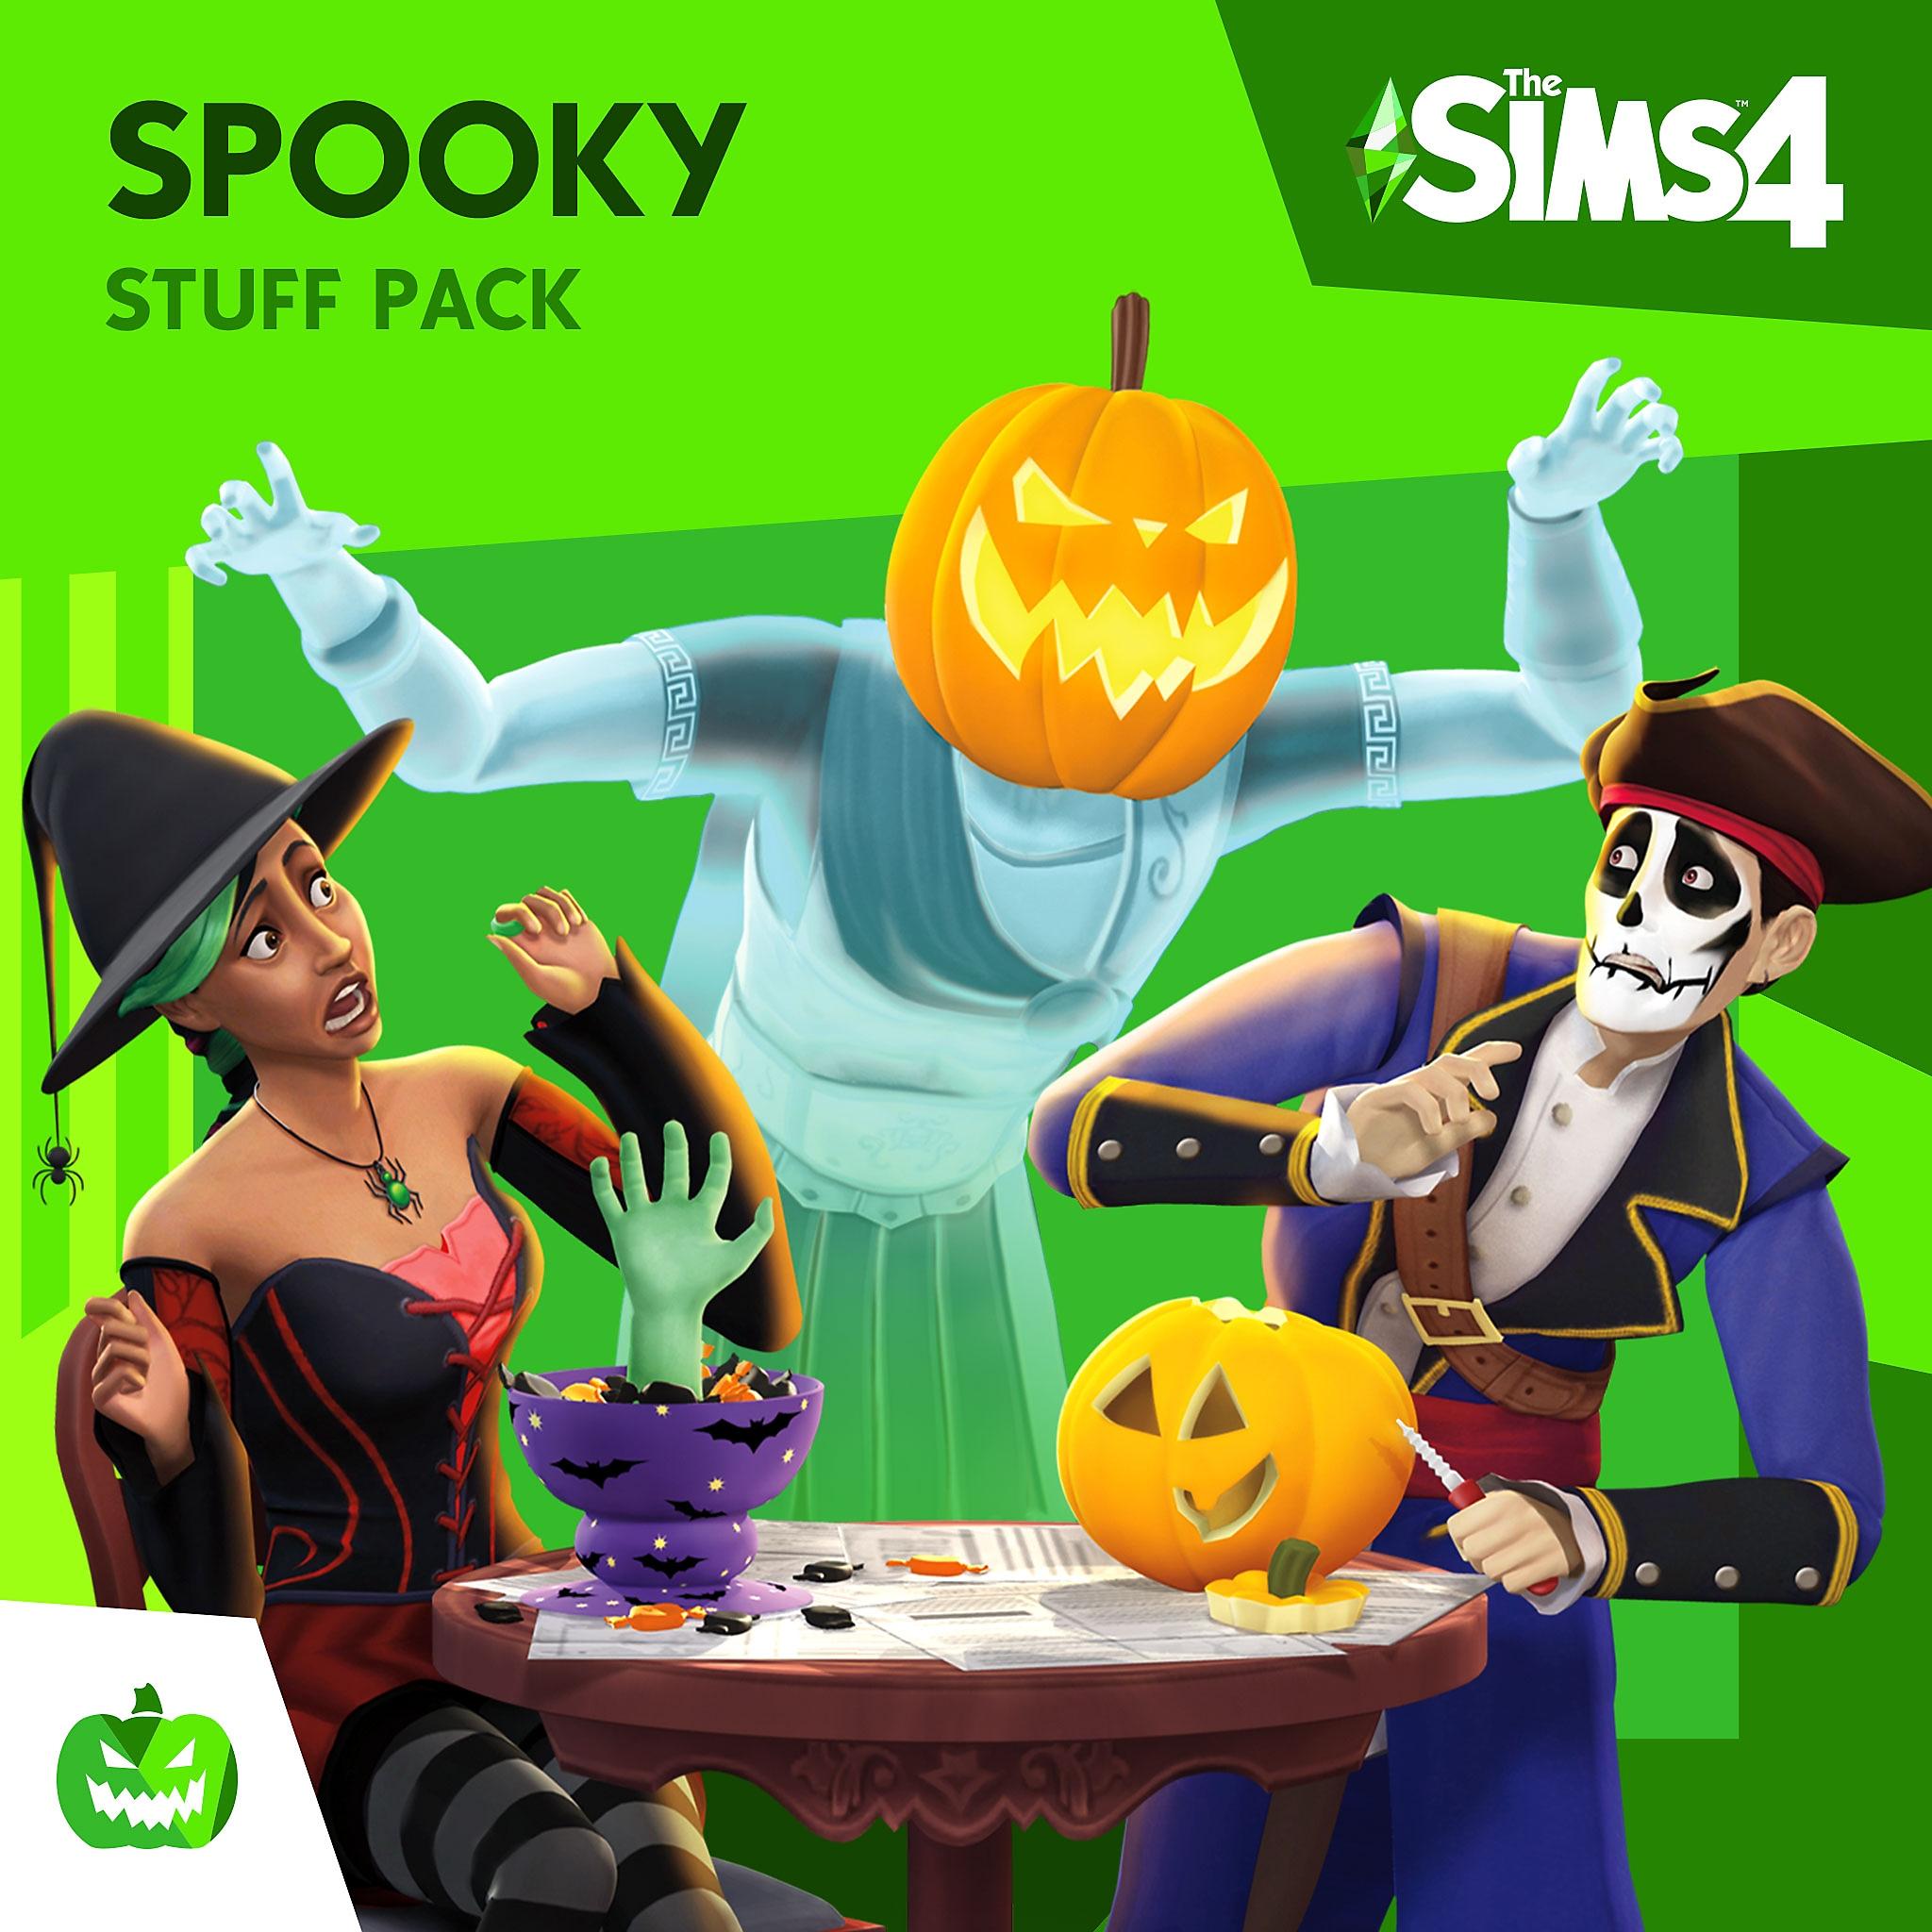 Spooky Stuff Pack